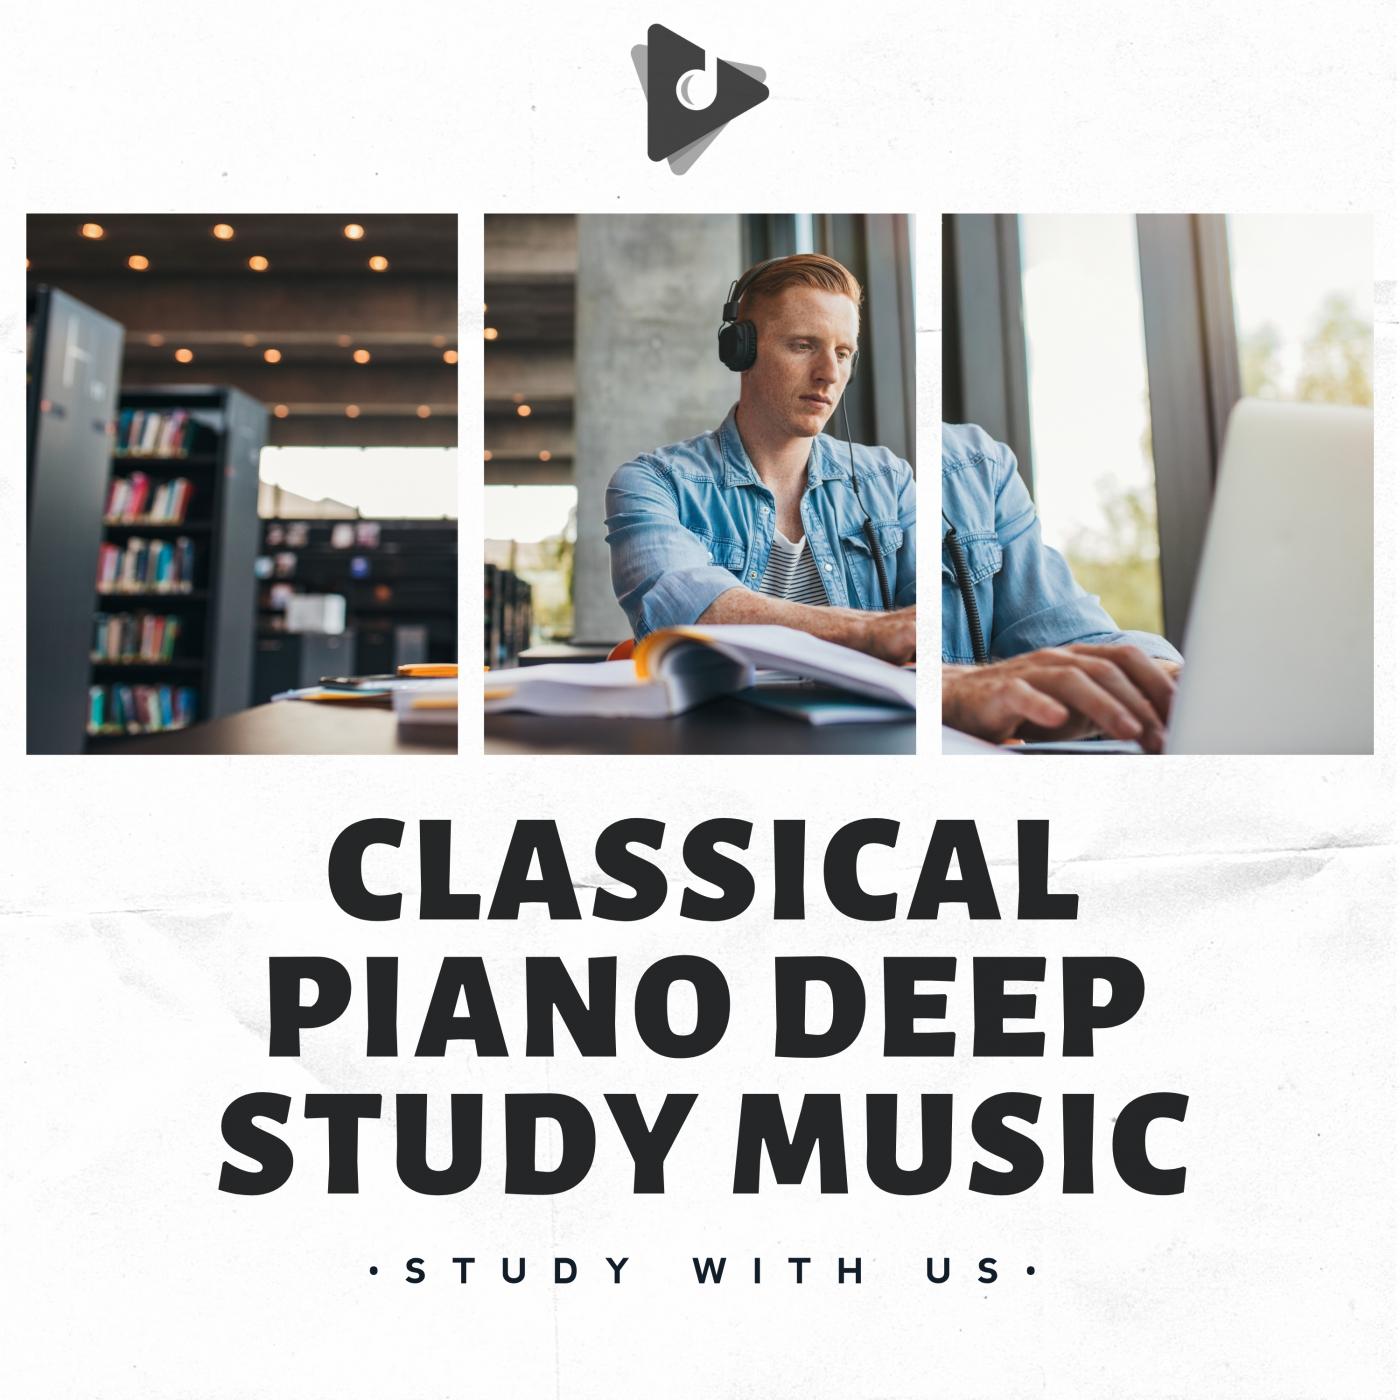 Classical Piano Deep Study Music